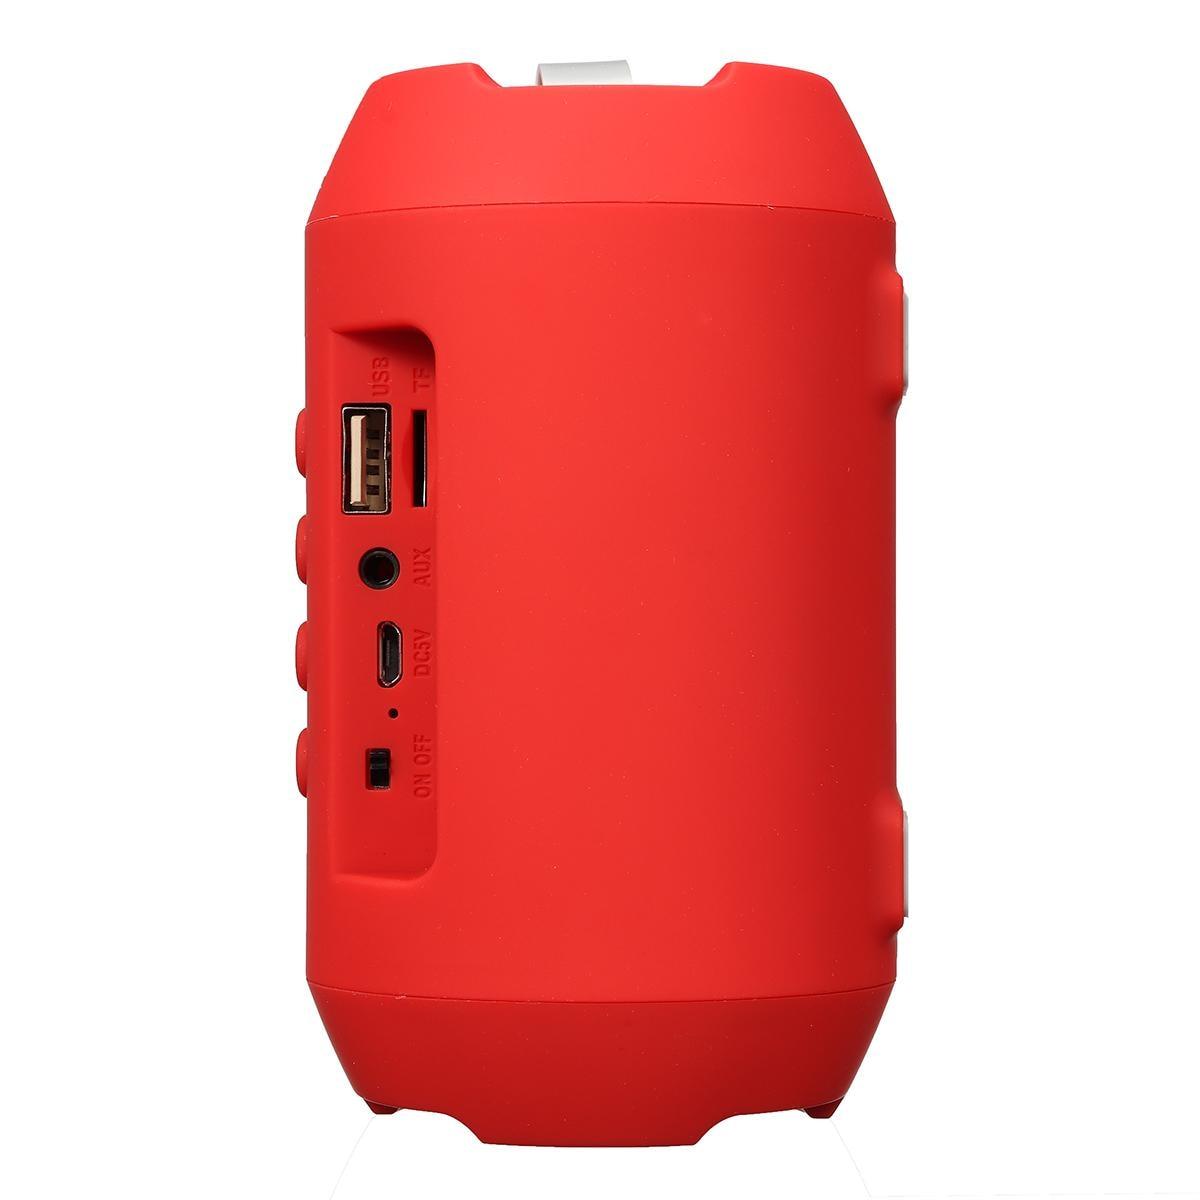 Tragbare Drahtlose bluetooth V 4,2 Lautsprecher Rechargable USB FM Radio Stereo Lautsprecher Sound System 3D Stereo Musik Lautsprecher